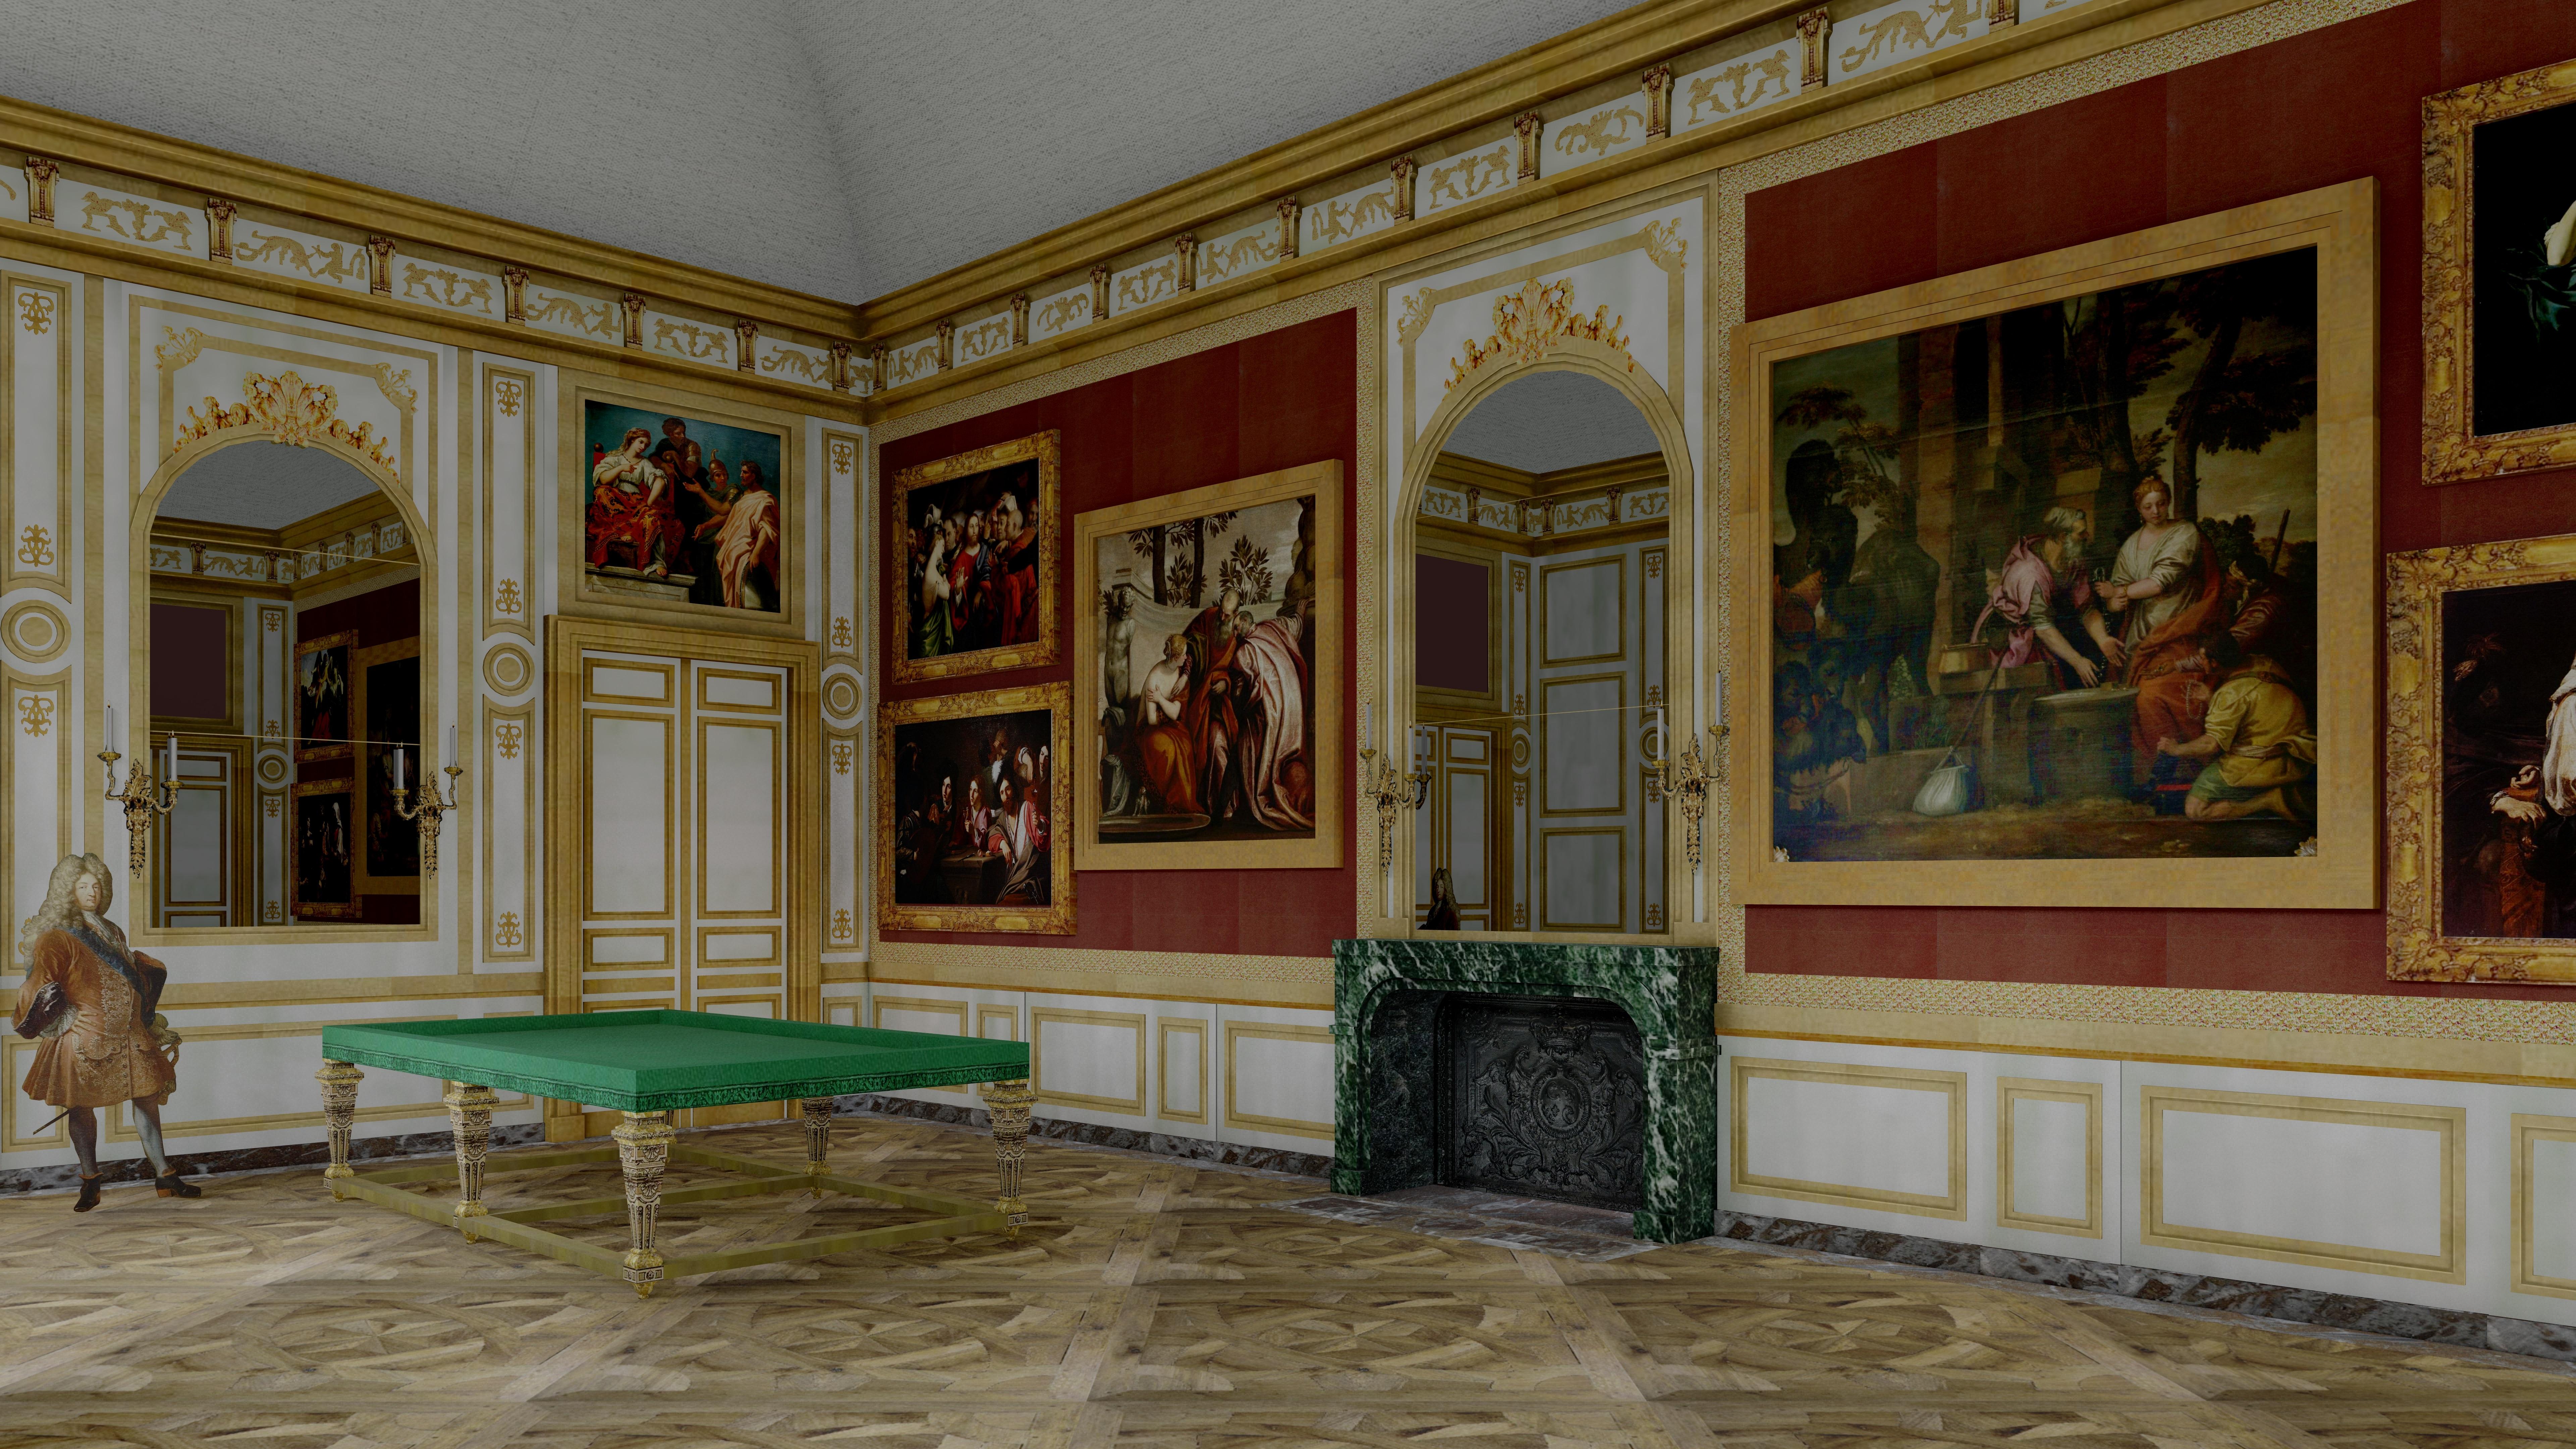 Filegrand Salon Aile Des Marronniers Chateau Meudonjpg